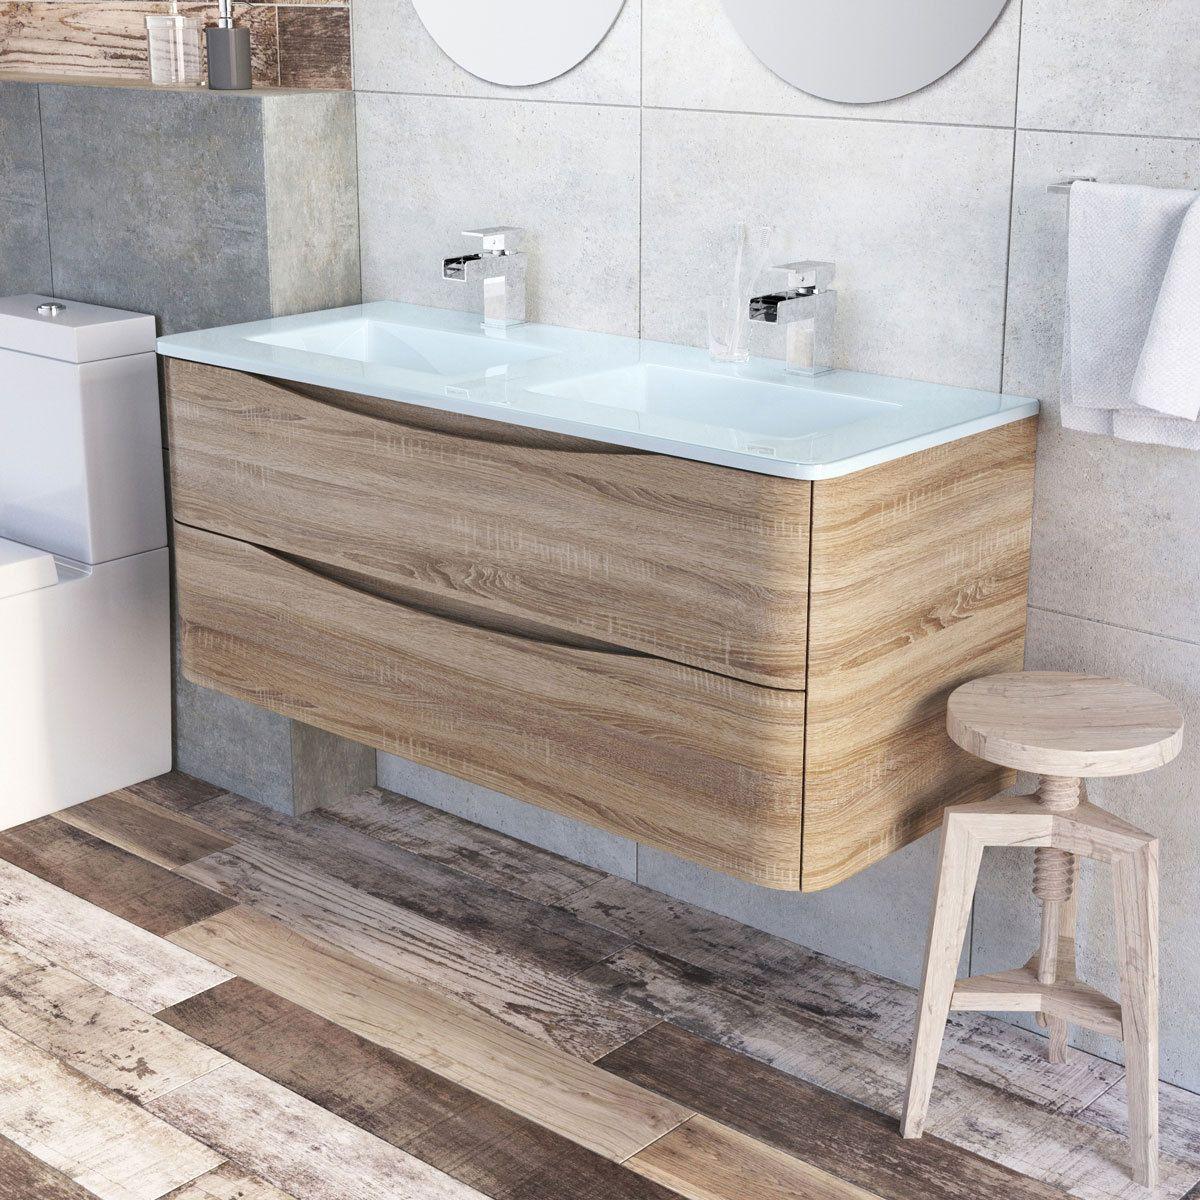 Eaton Light Ash Bathroom Wall Hung Vanity Unit White Glass Basin